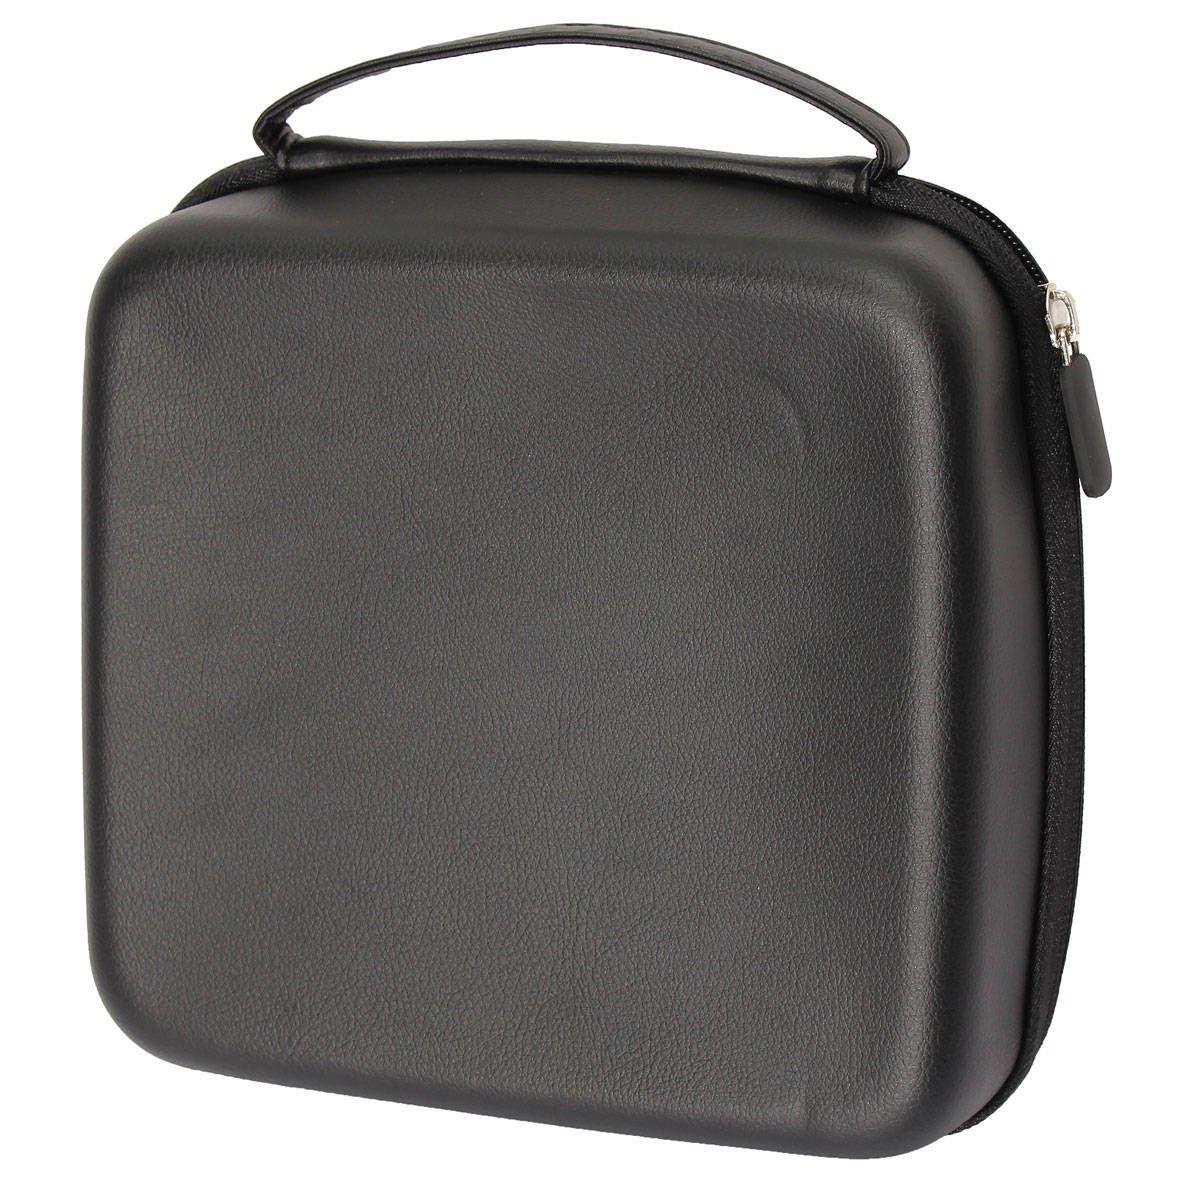 Universal Portable Waterproof 7 Inch GPS Carry Travel Case Protector Cover Bag For Garmin Nuvi/TomTom/Magellan/GPS Sat Nav